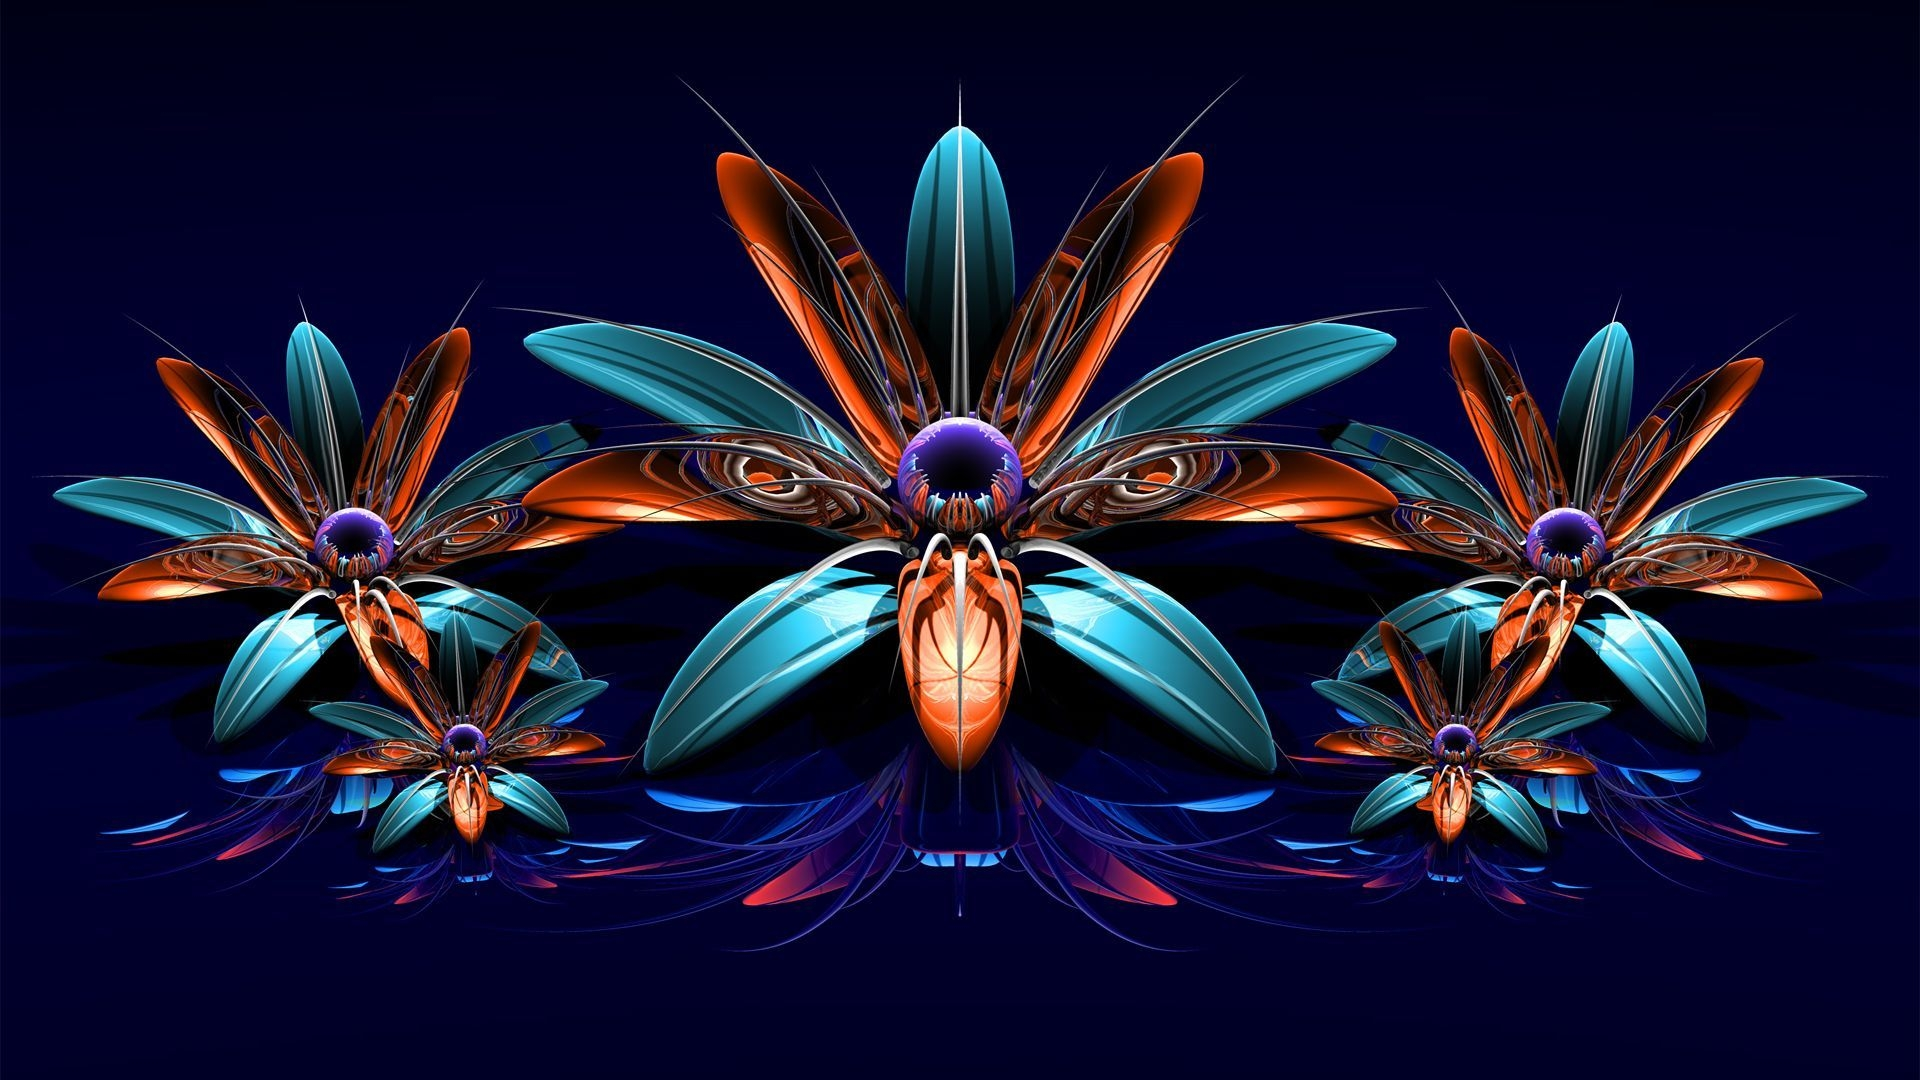 Download Wallpaper 1920x1080 Flowers Fractal Bouquet Full HD 1080p